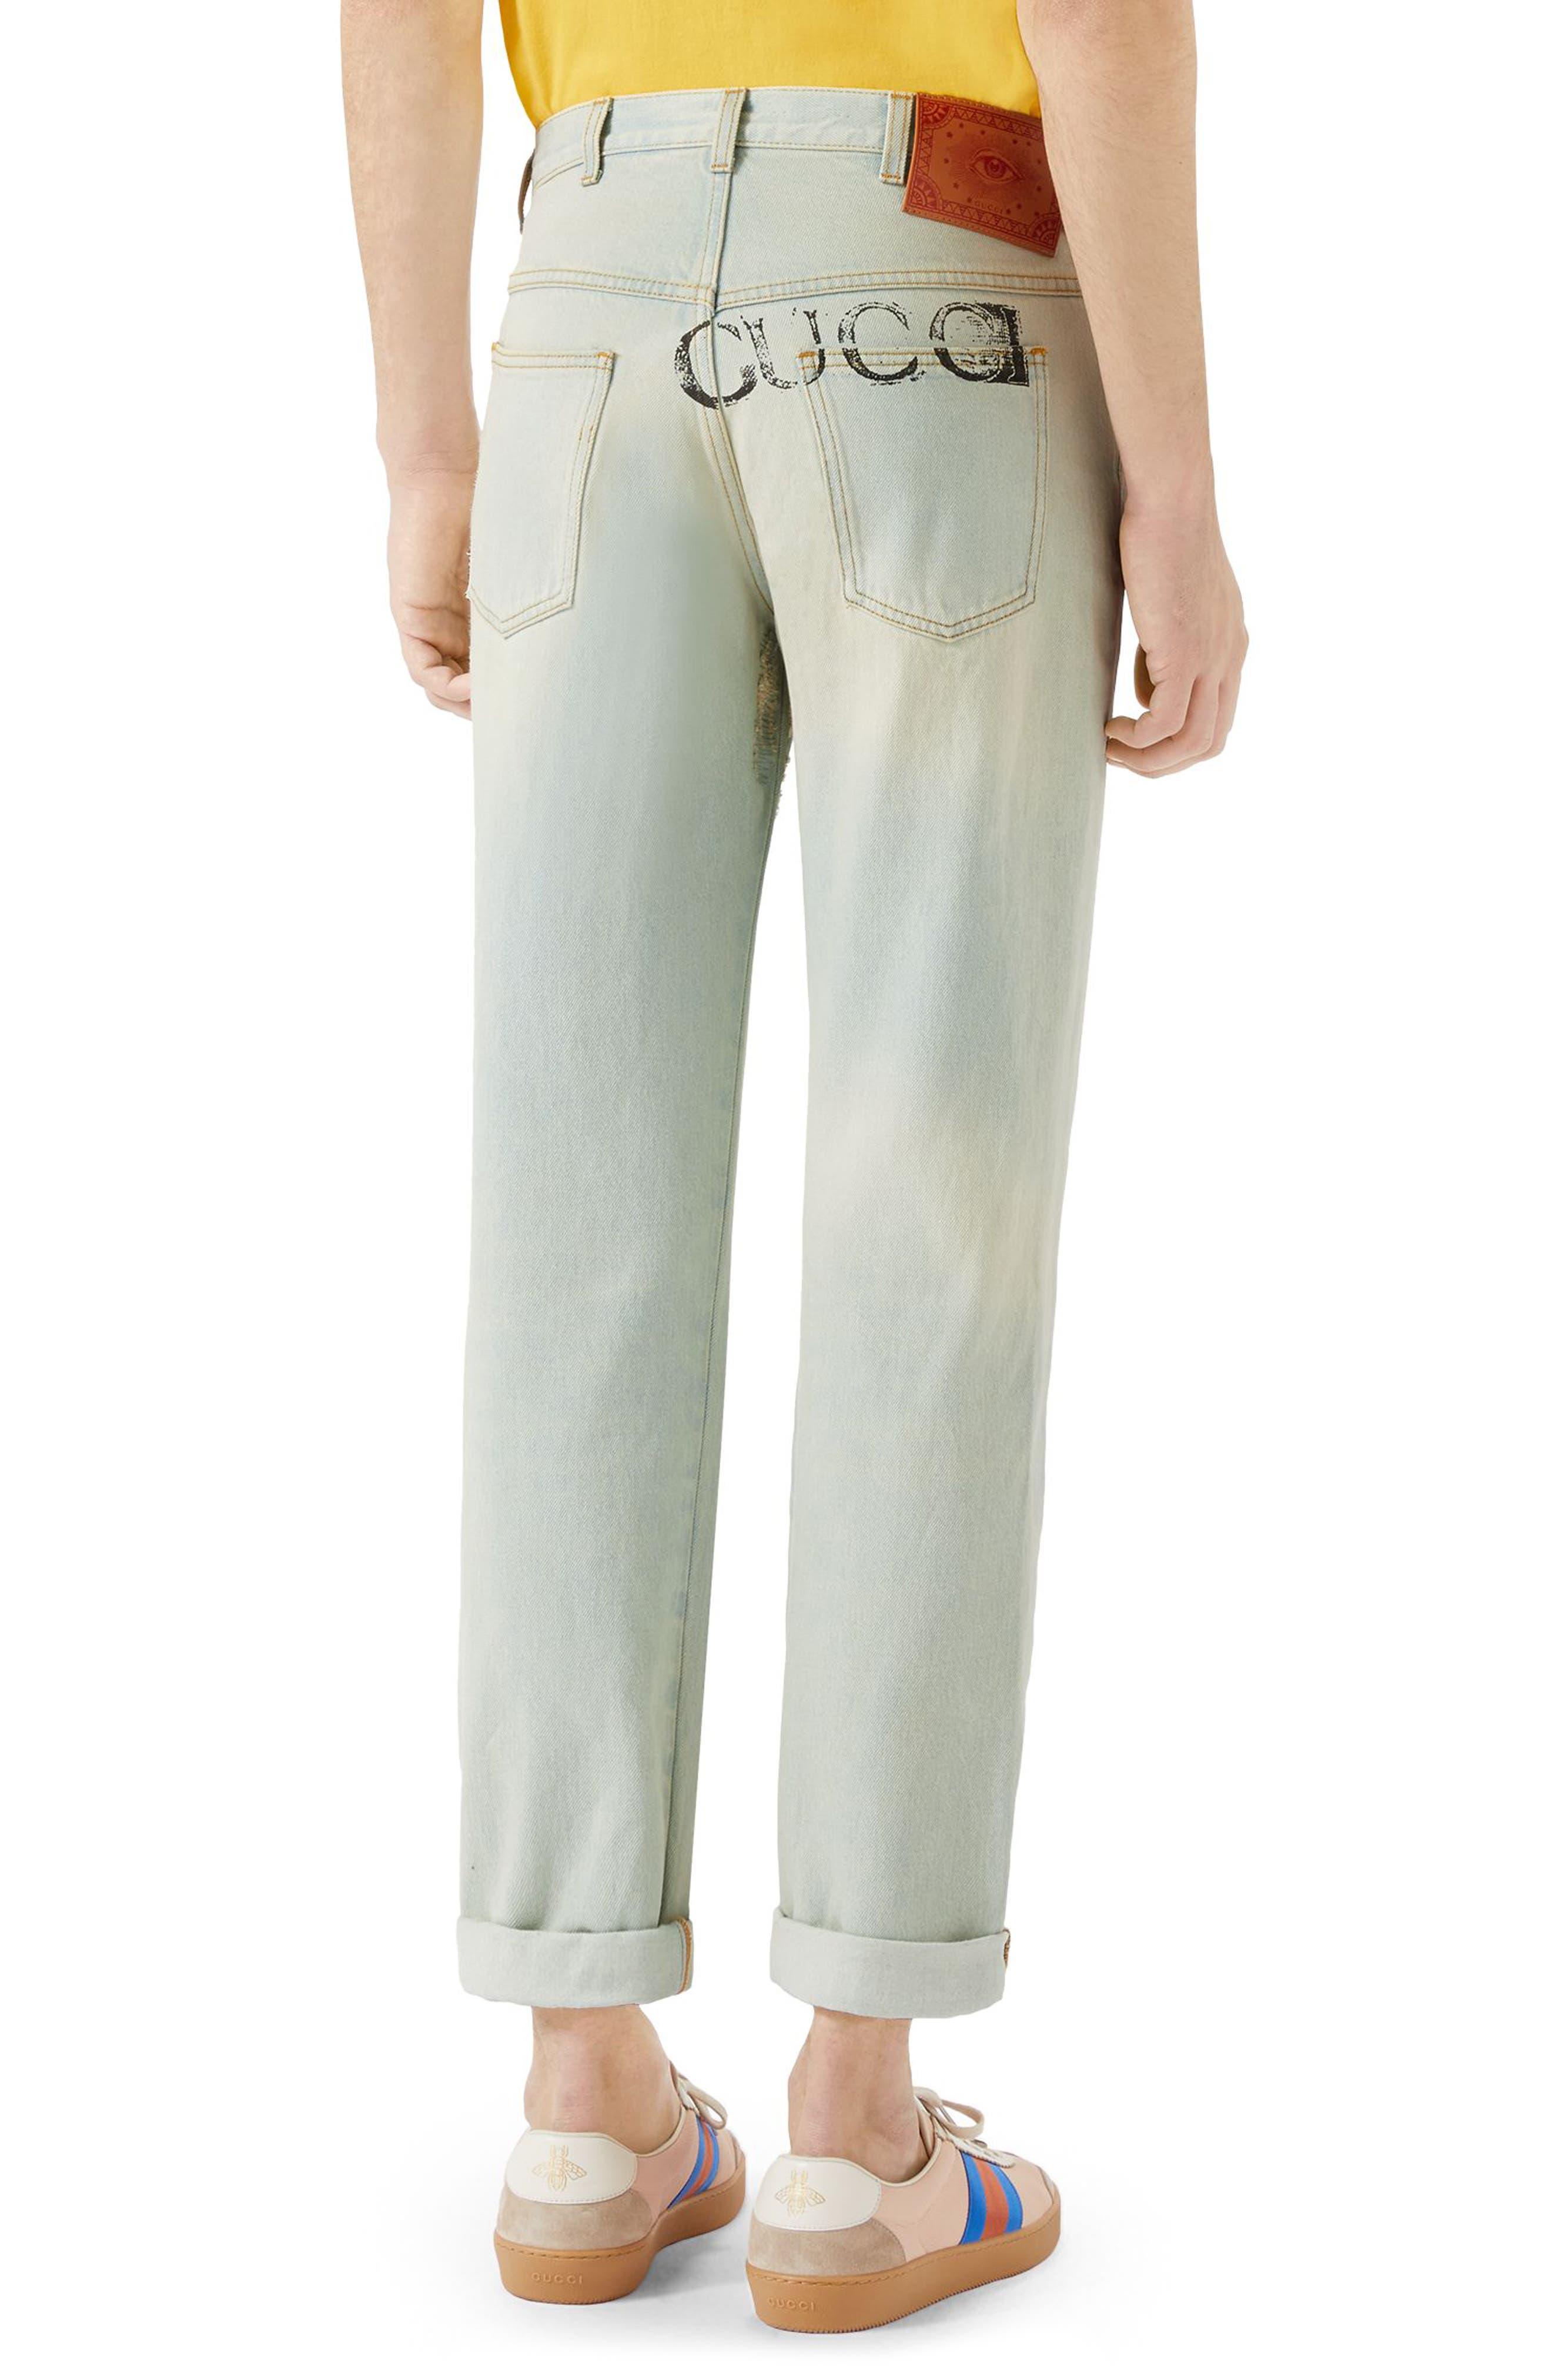 Bleach Washed Jeans,                             Alternate thumbnail 2, color,                             Light Blue